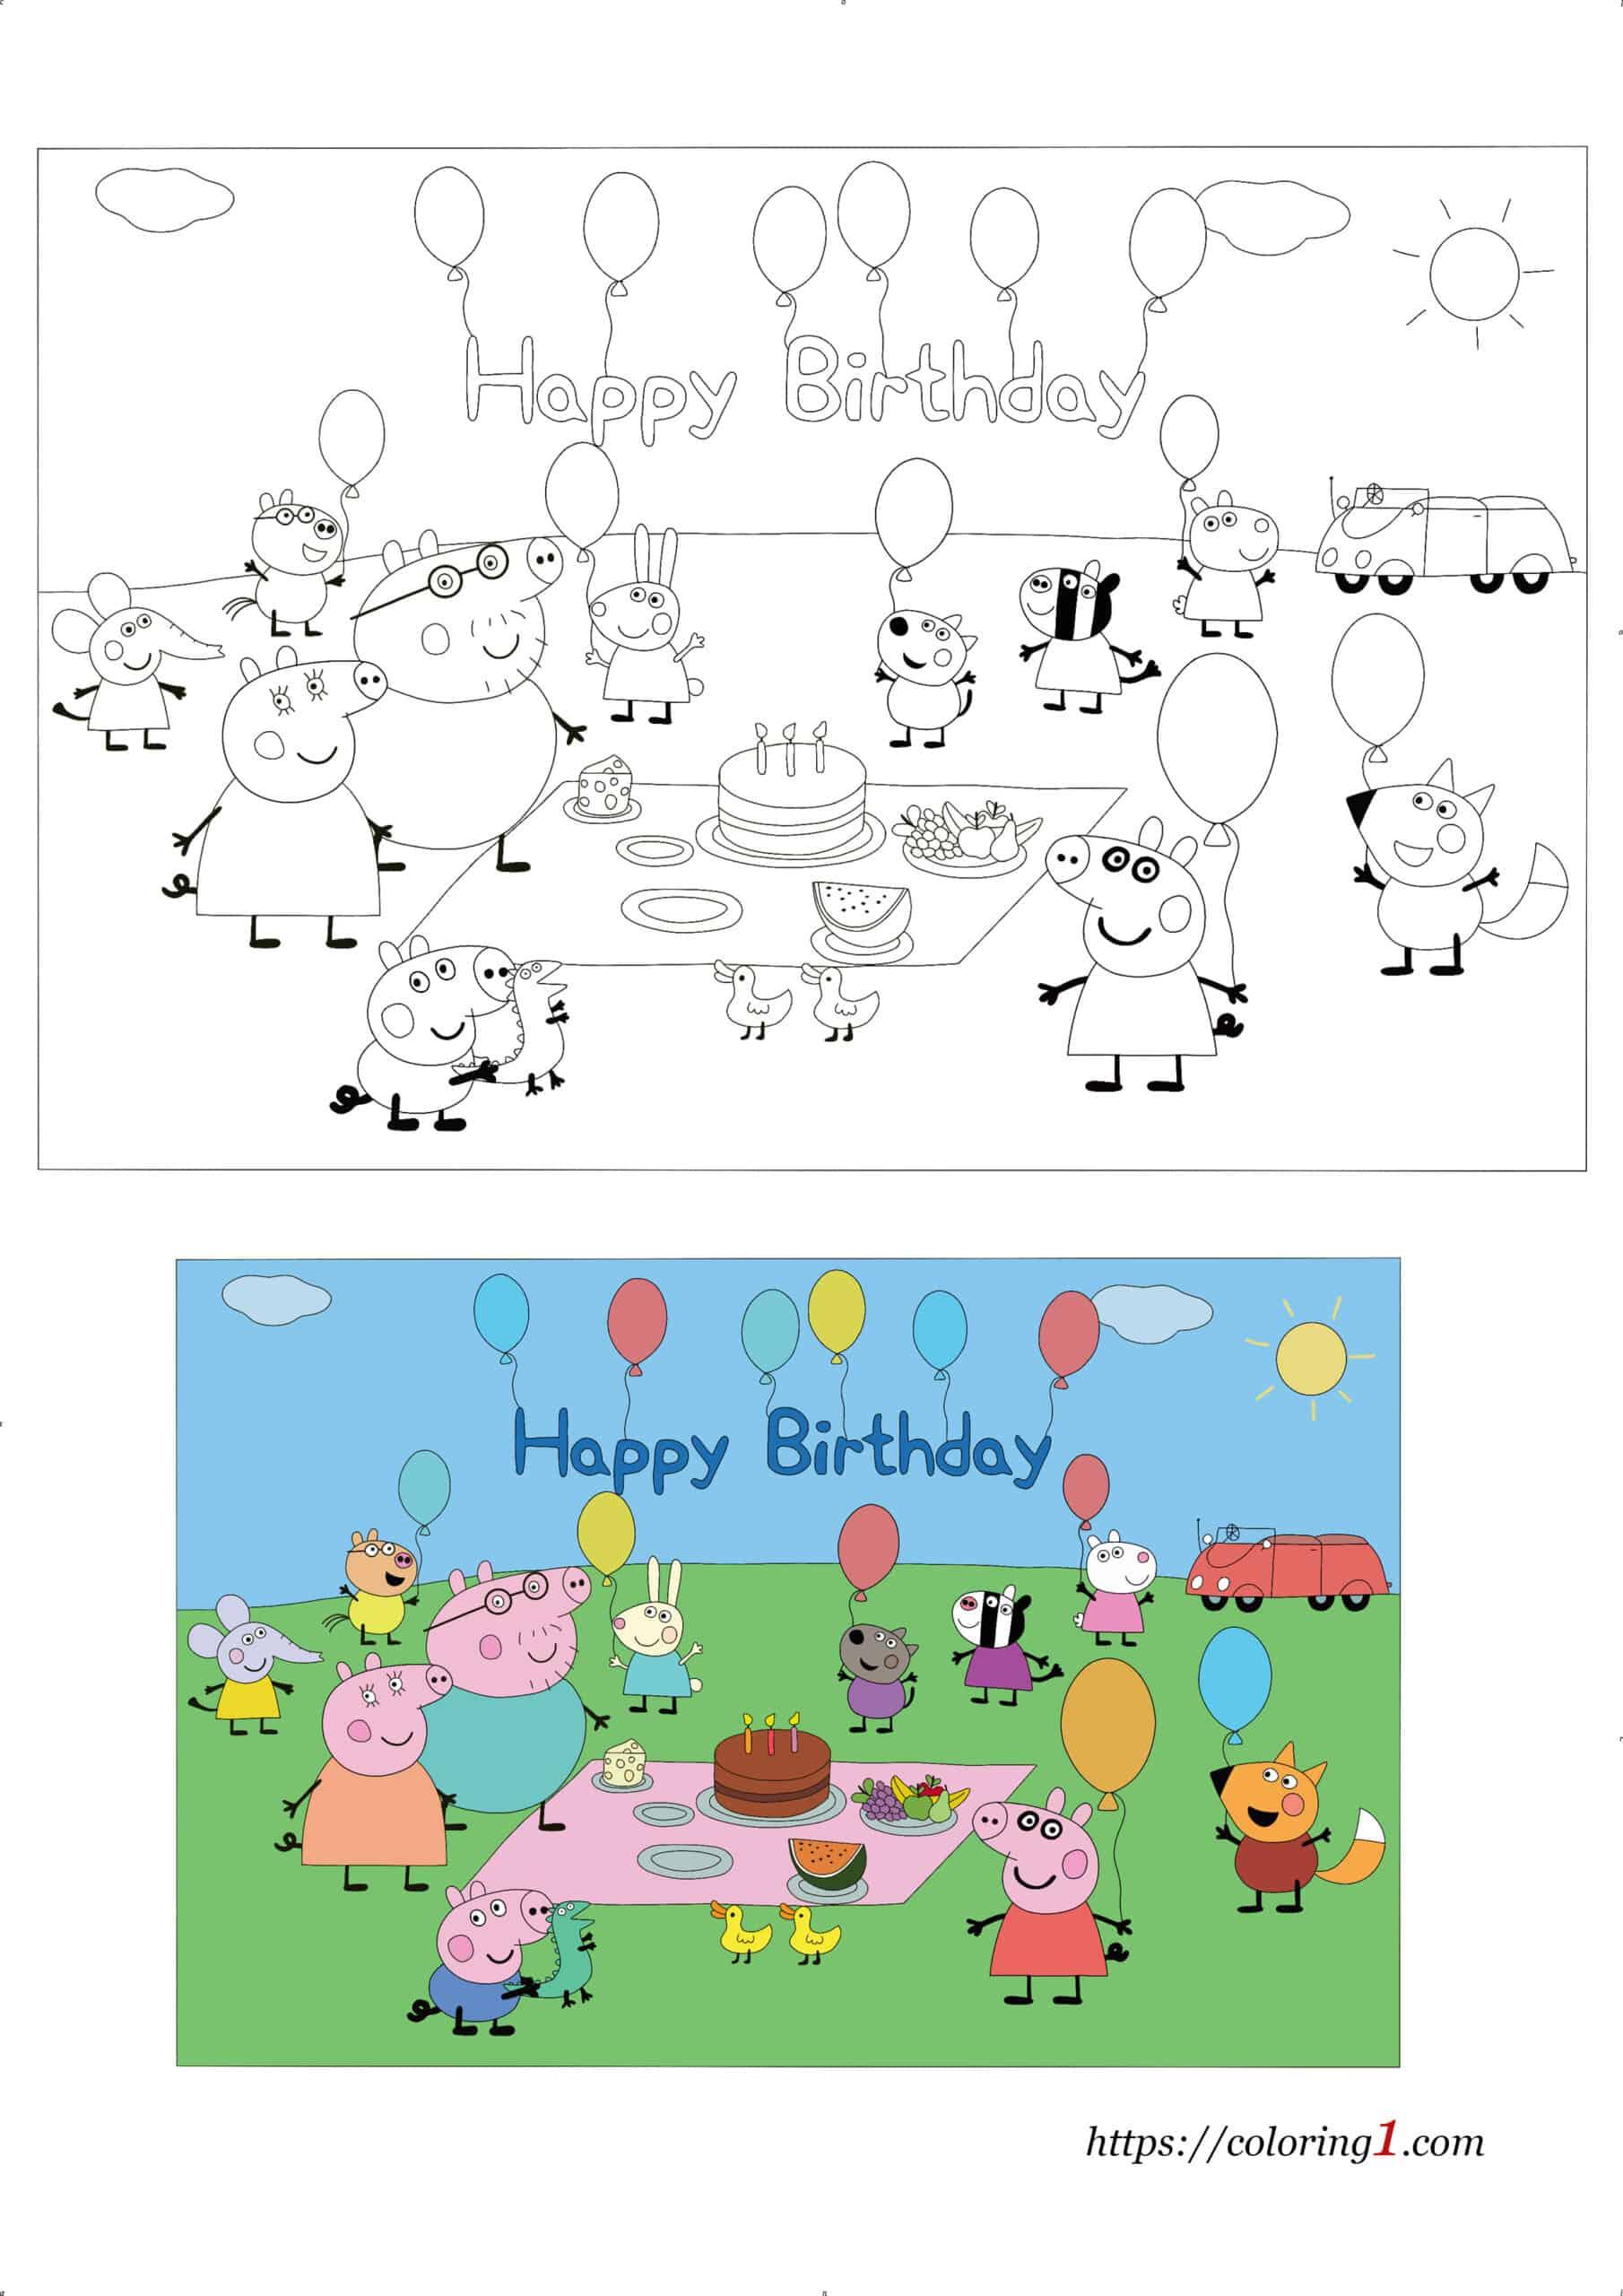 Happy Birthday Peppa Pig printable coloring page